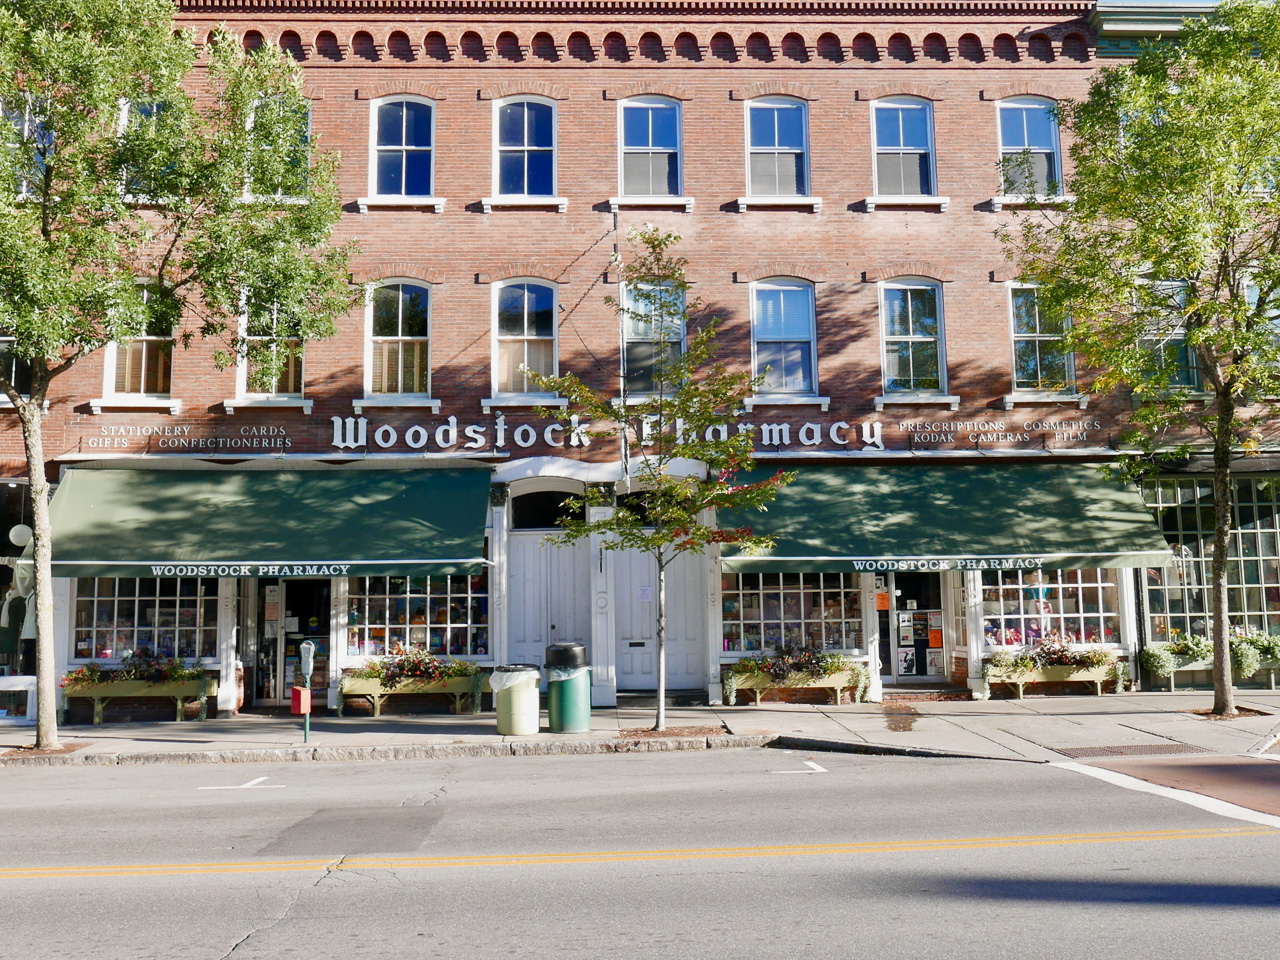 Cara Sharratt Travel - Woodstock Pharmacy - Woodstock, Vermont